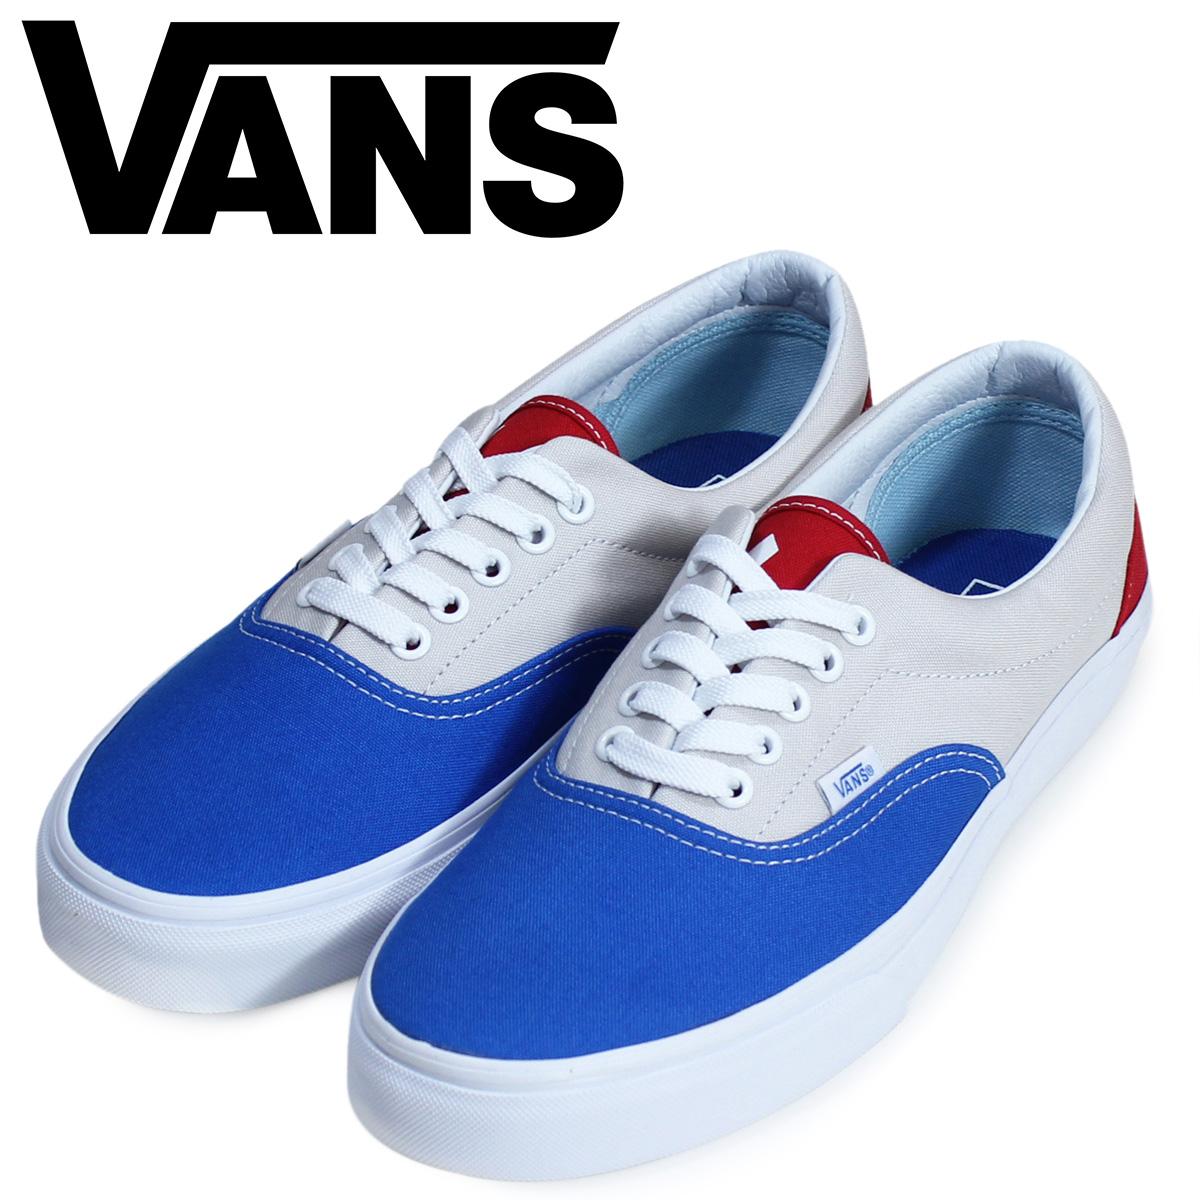 676fd63f7c VANS ERA PRO vans gills pro men sneakers VN0A38FRMV2 station wagons shoes  blue  2 22 Shinnyu load